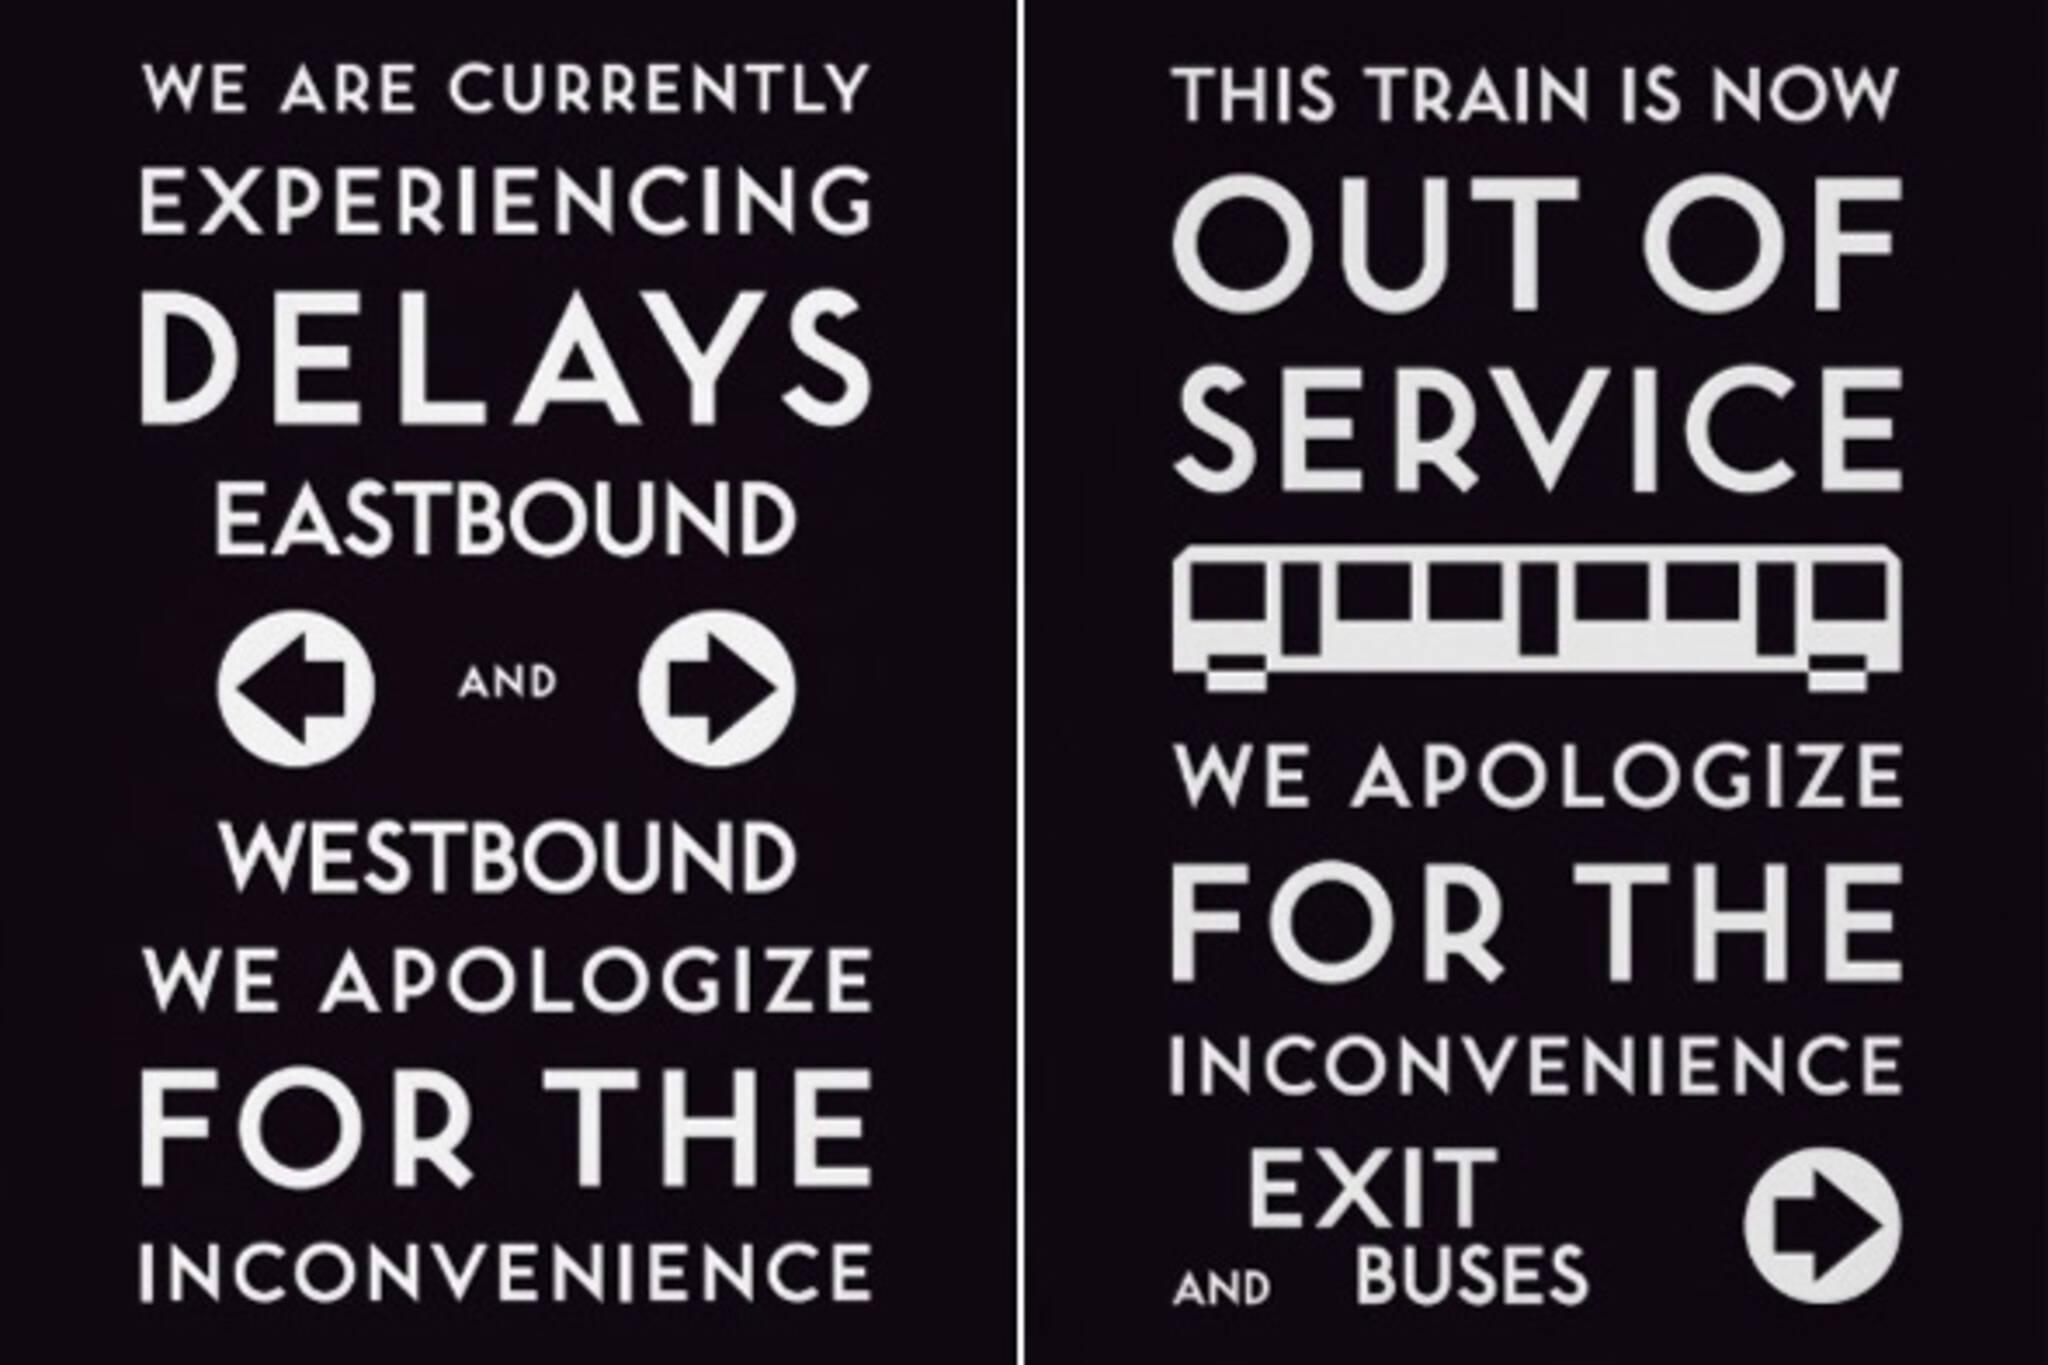 TTC posters